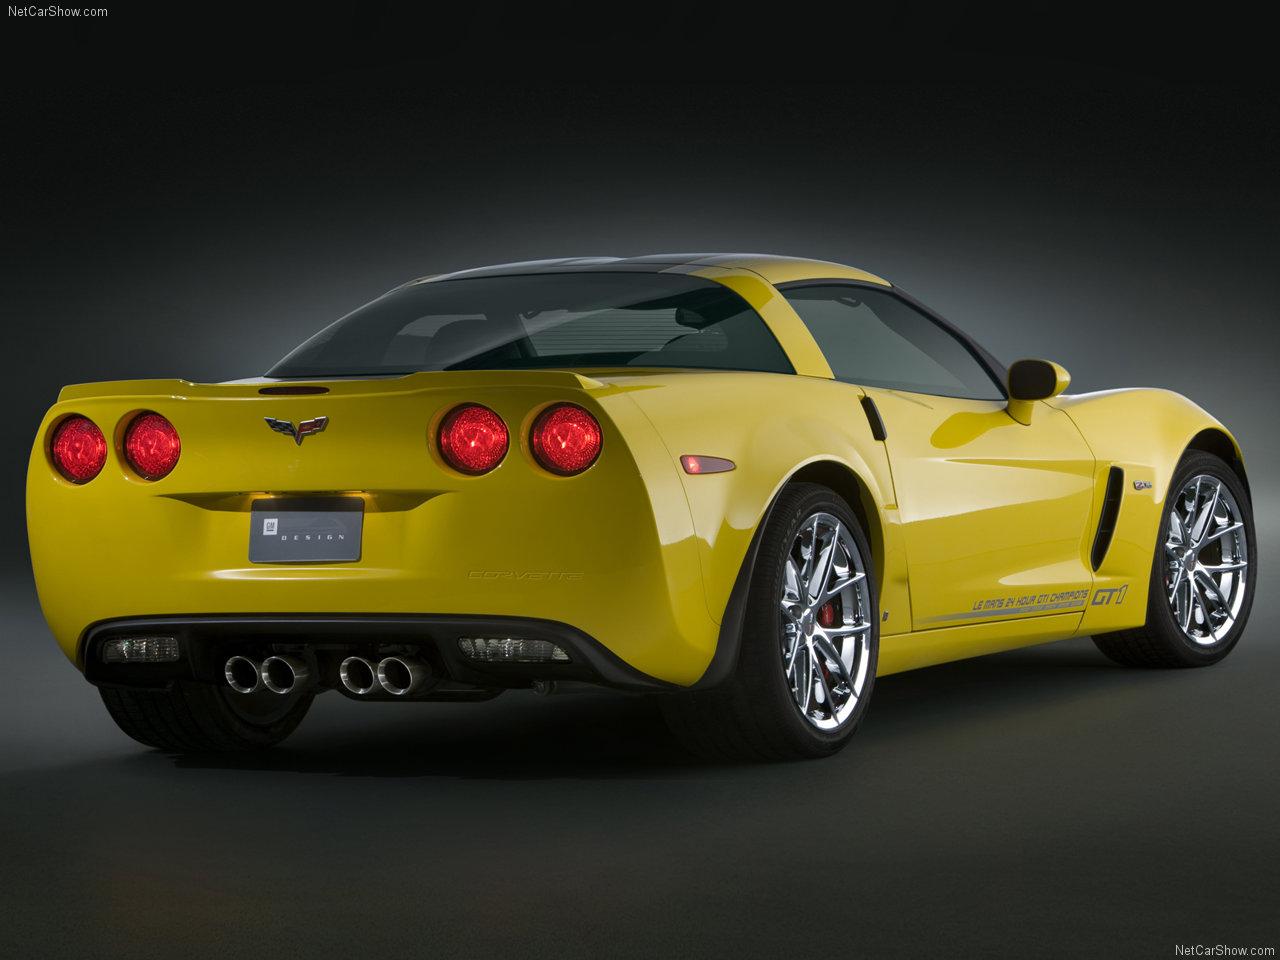 http://2.bp.blogspot.com/-qOJ5JgQ_O1s/TW9vAxPpKPI/AAAAAAAALno/-lGOvu0Aky4/s1600/Chevrolet-Corvette_GT1_2009_1280x960_wallpaper_03.jpg